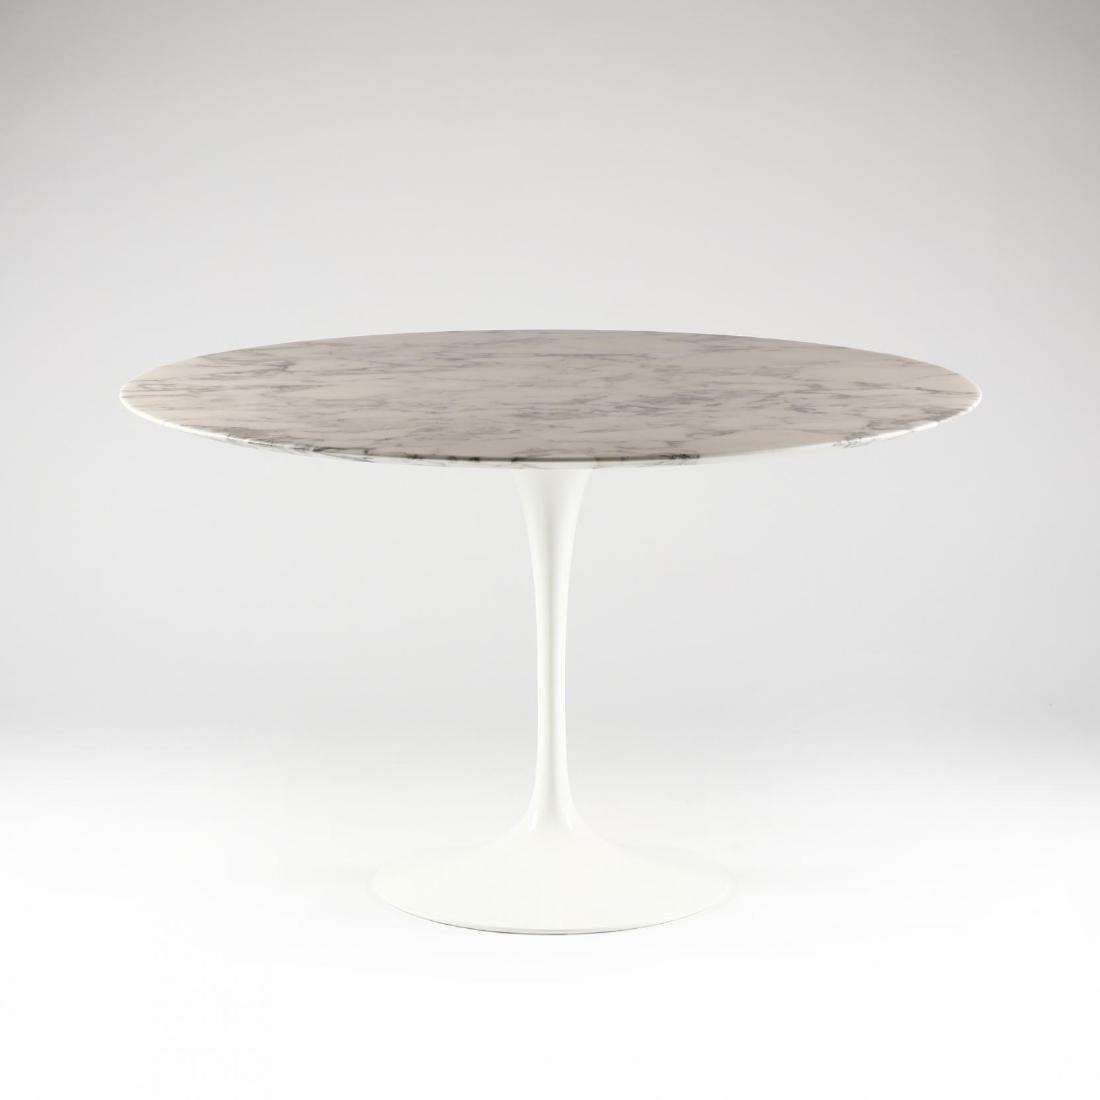 Eero Saarinen, Round Marble Top  Tulip Table